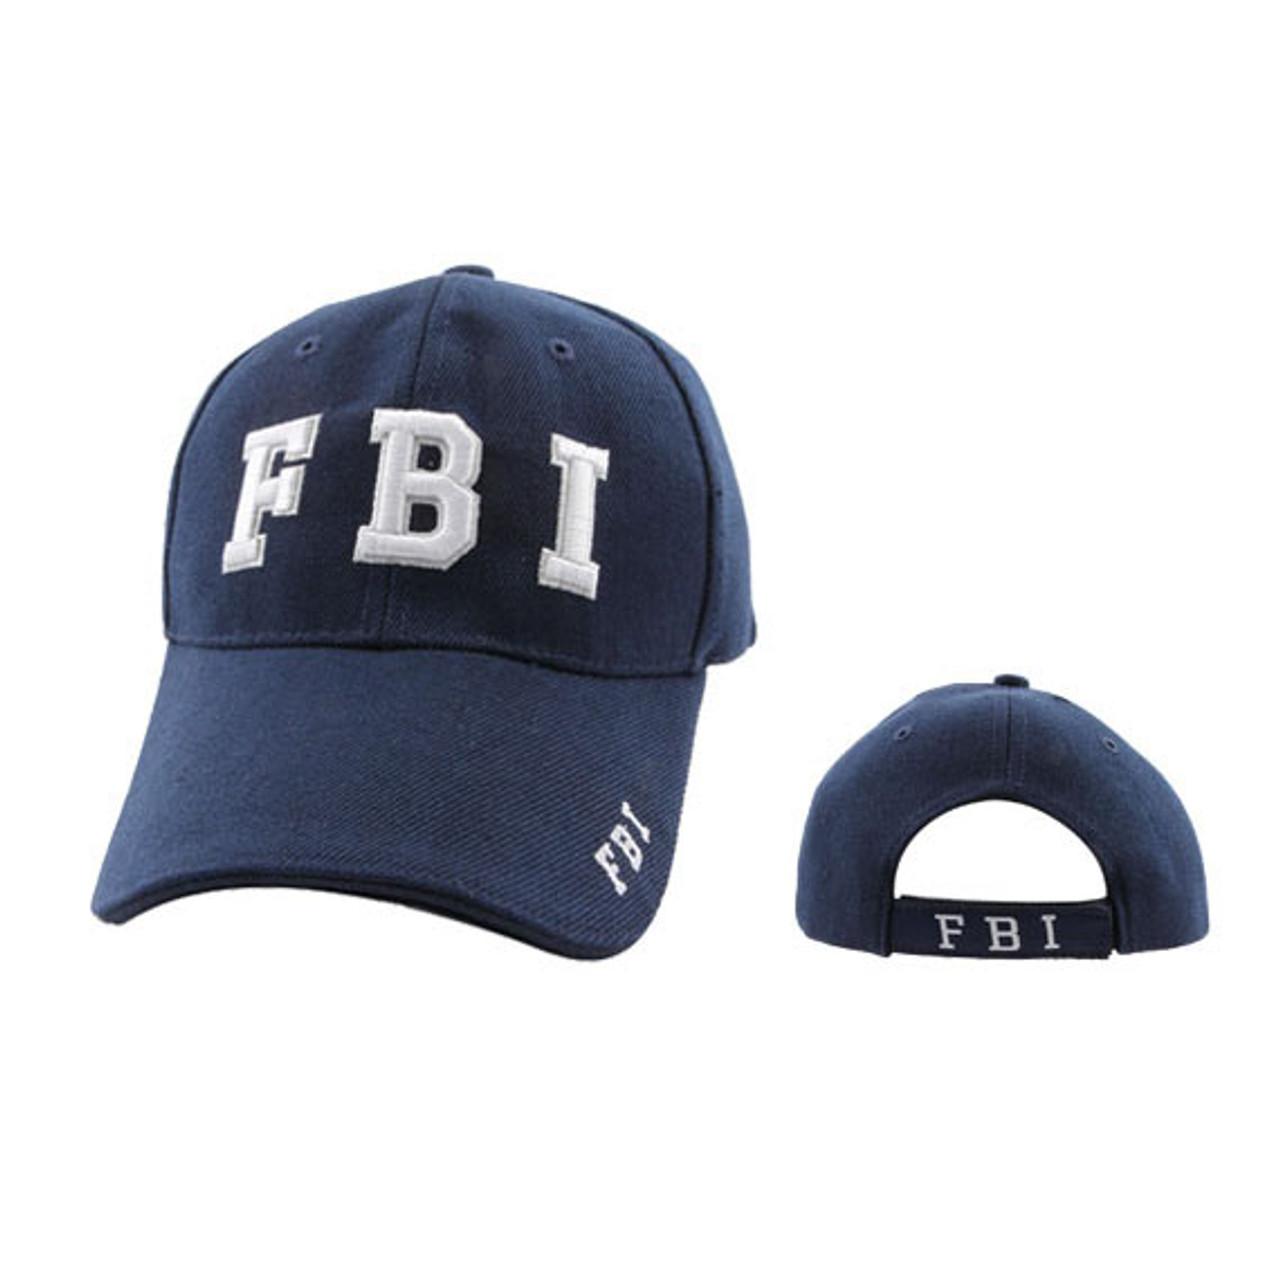 FBI Baseball Hat Wholesale-Blue